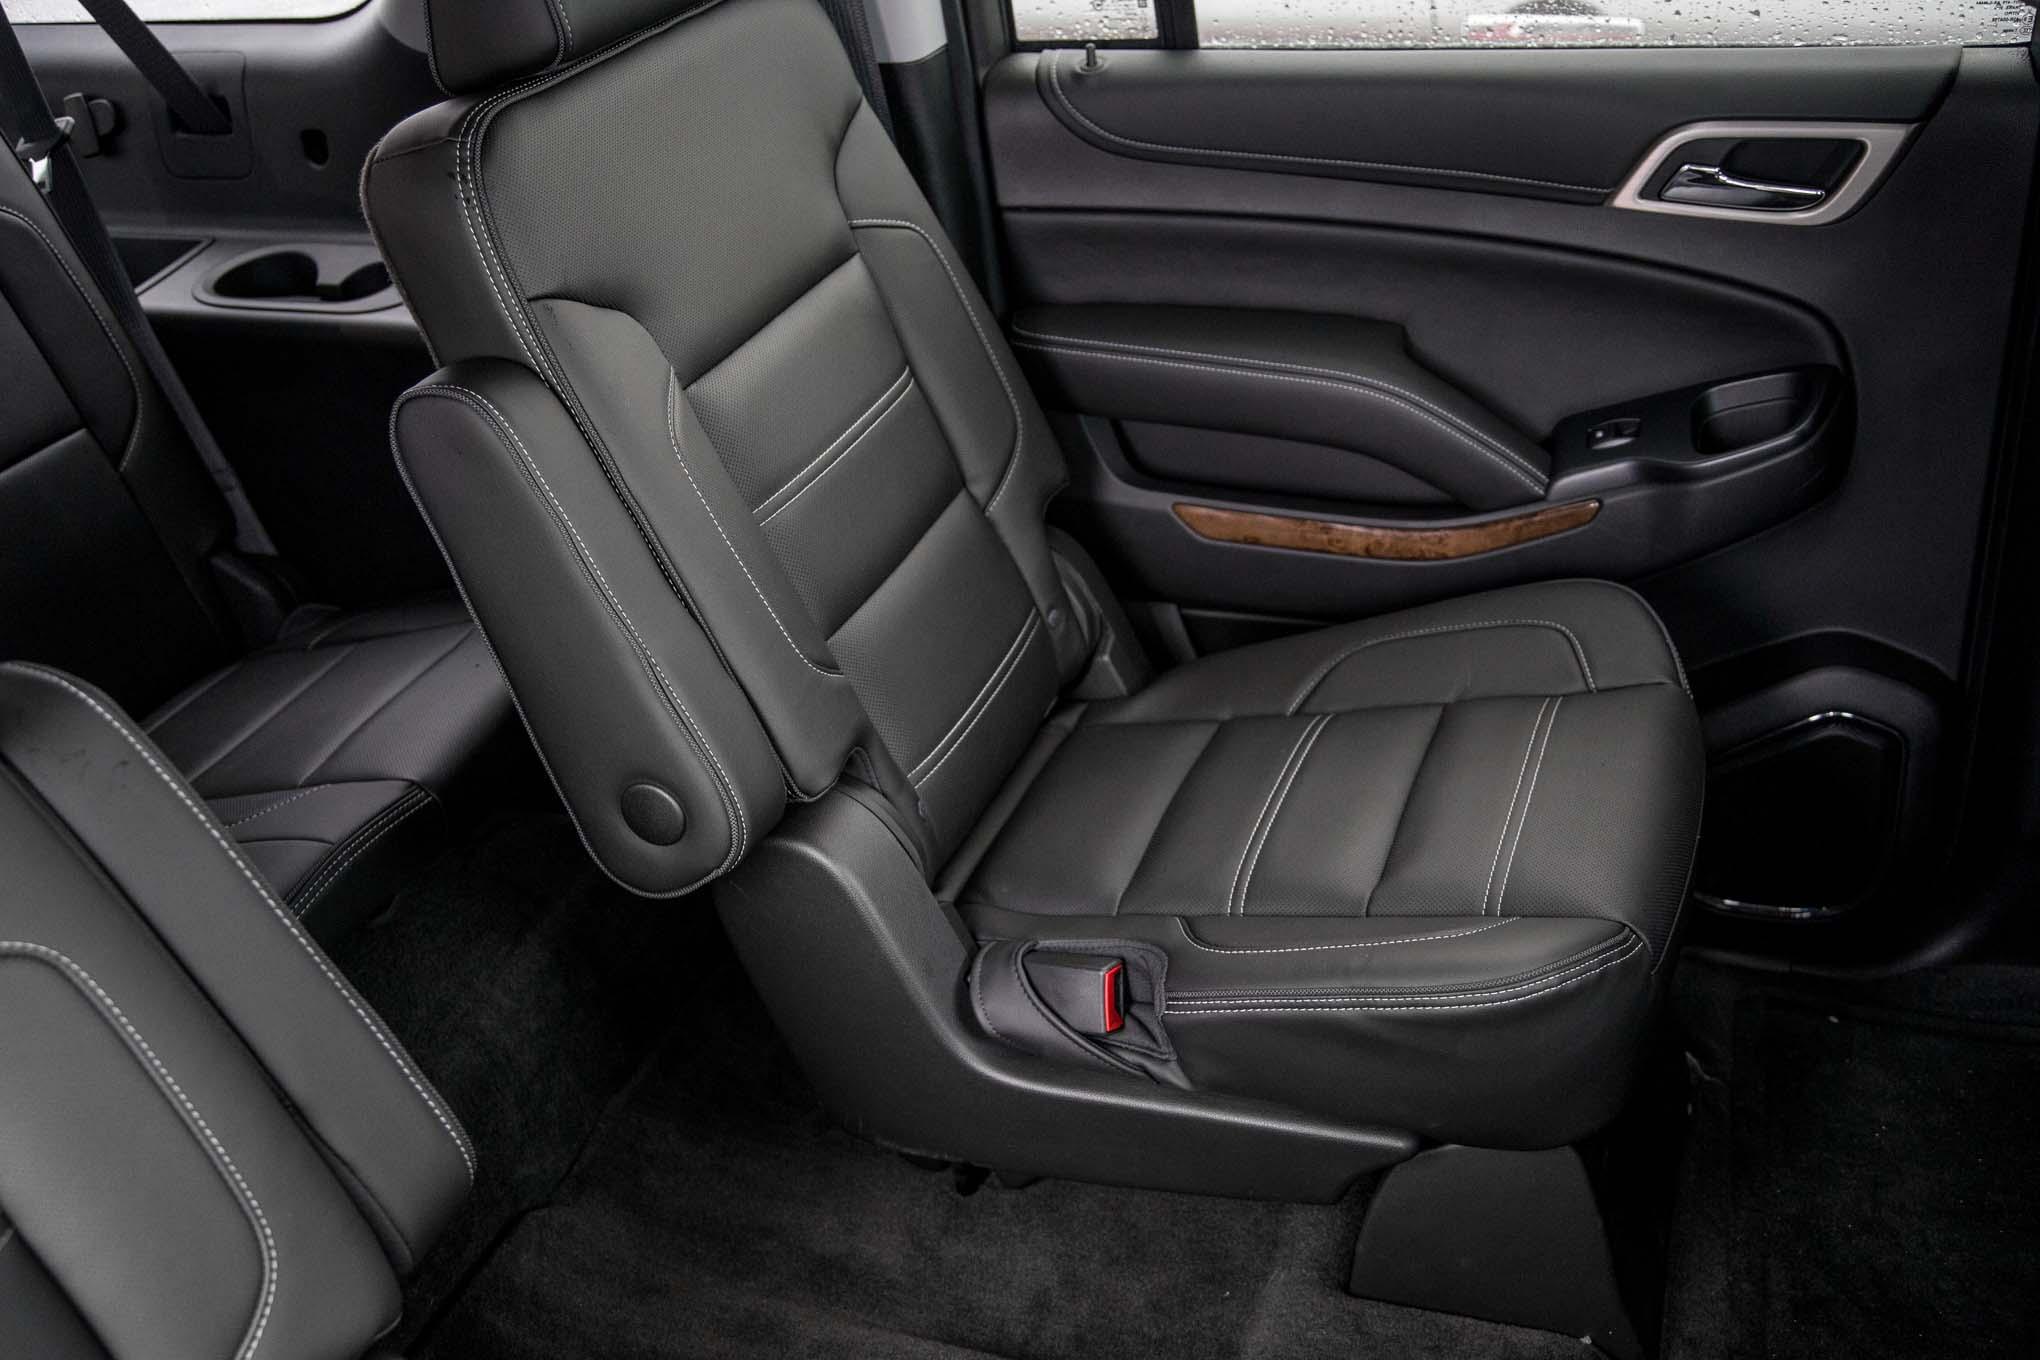 2015 GMC Yukon XL Center Seat Interior